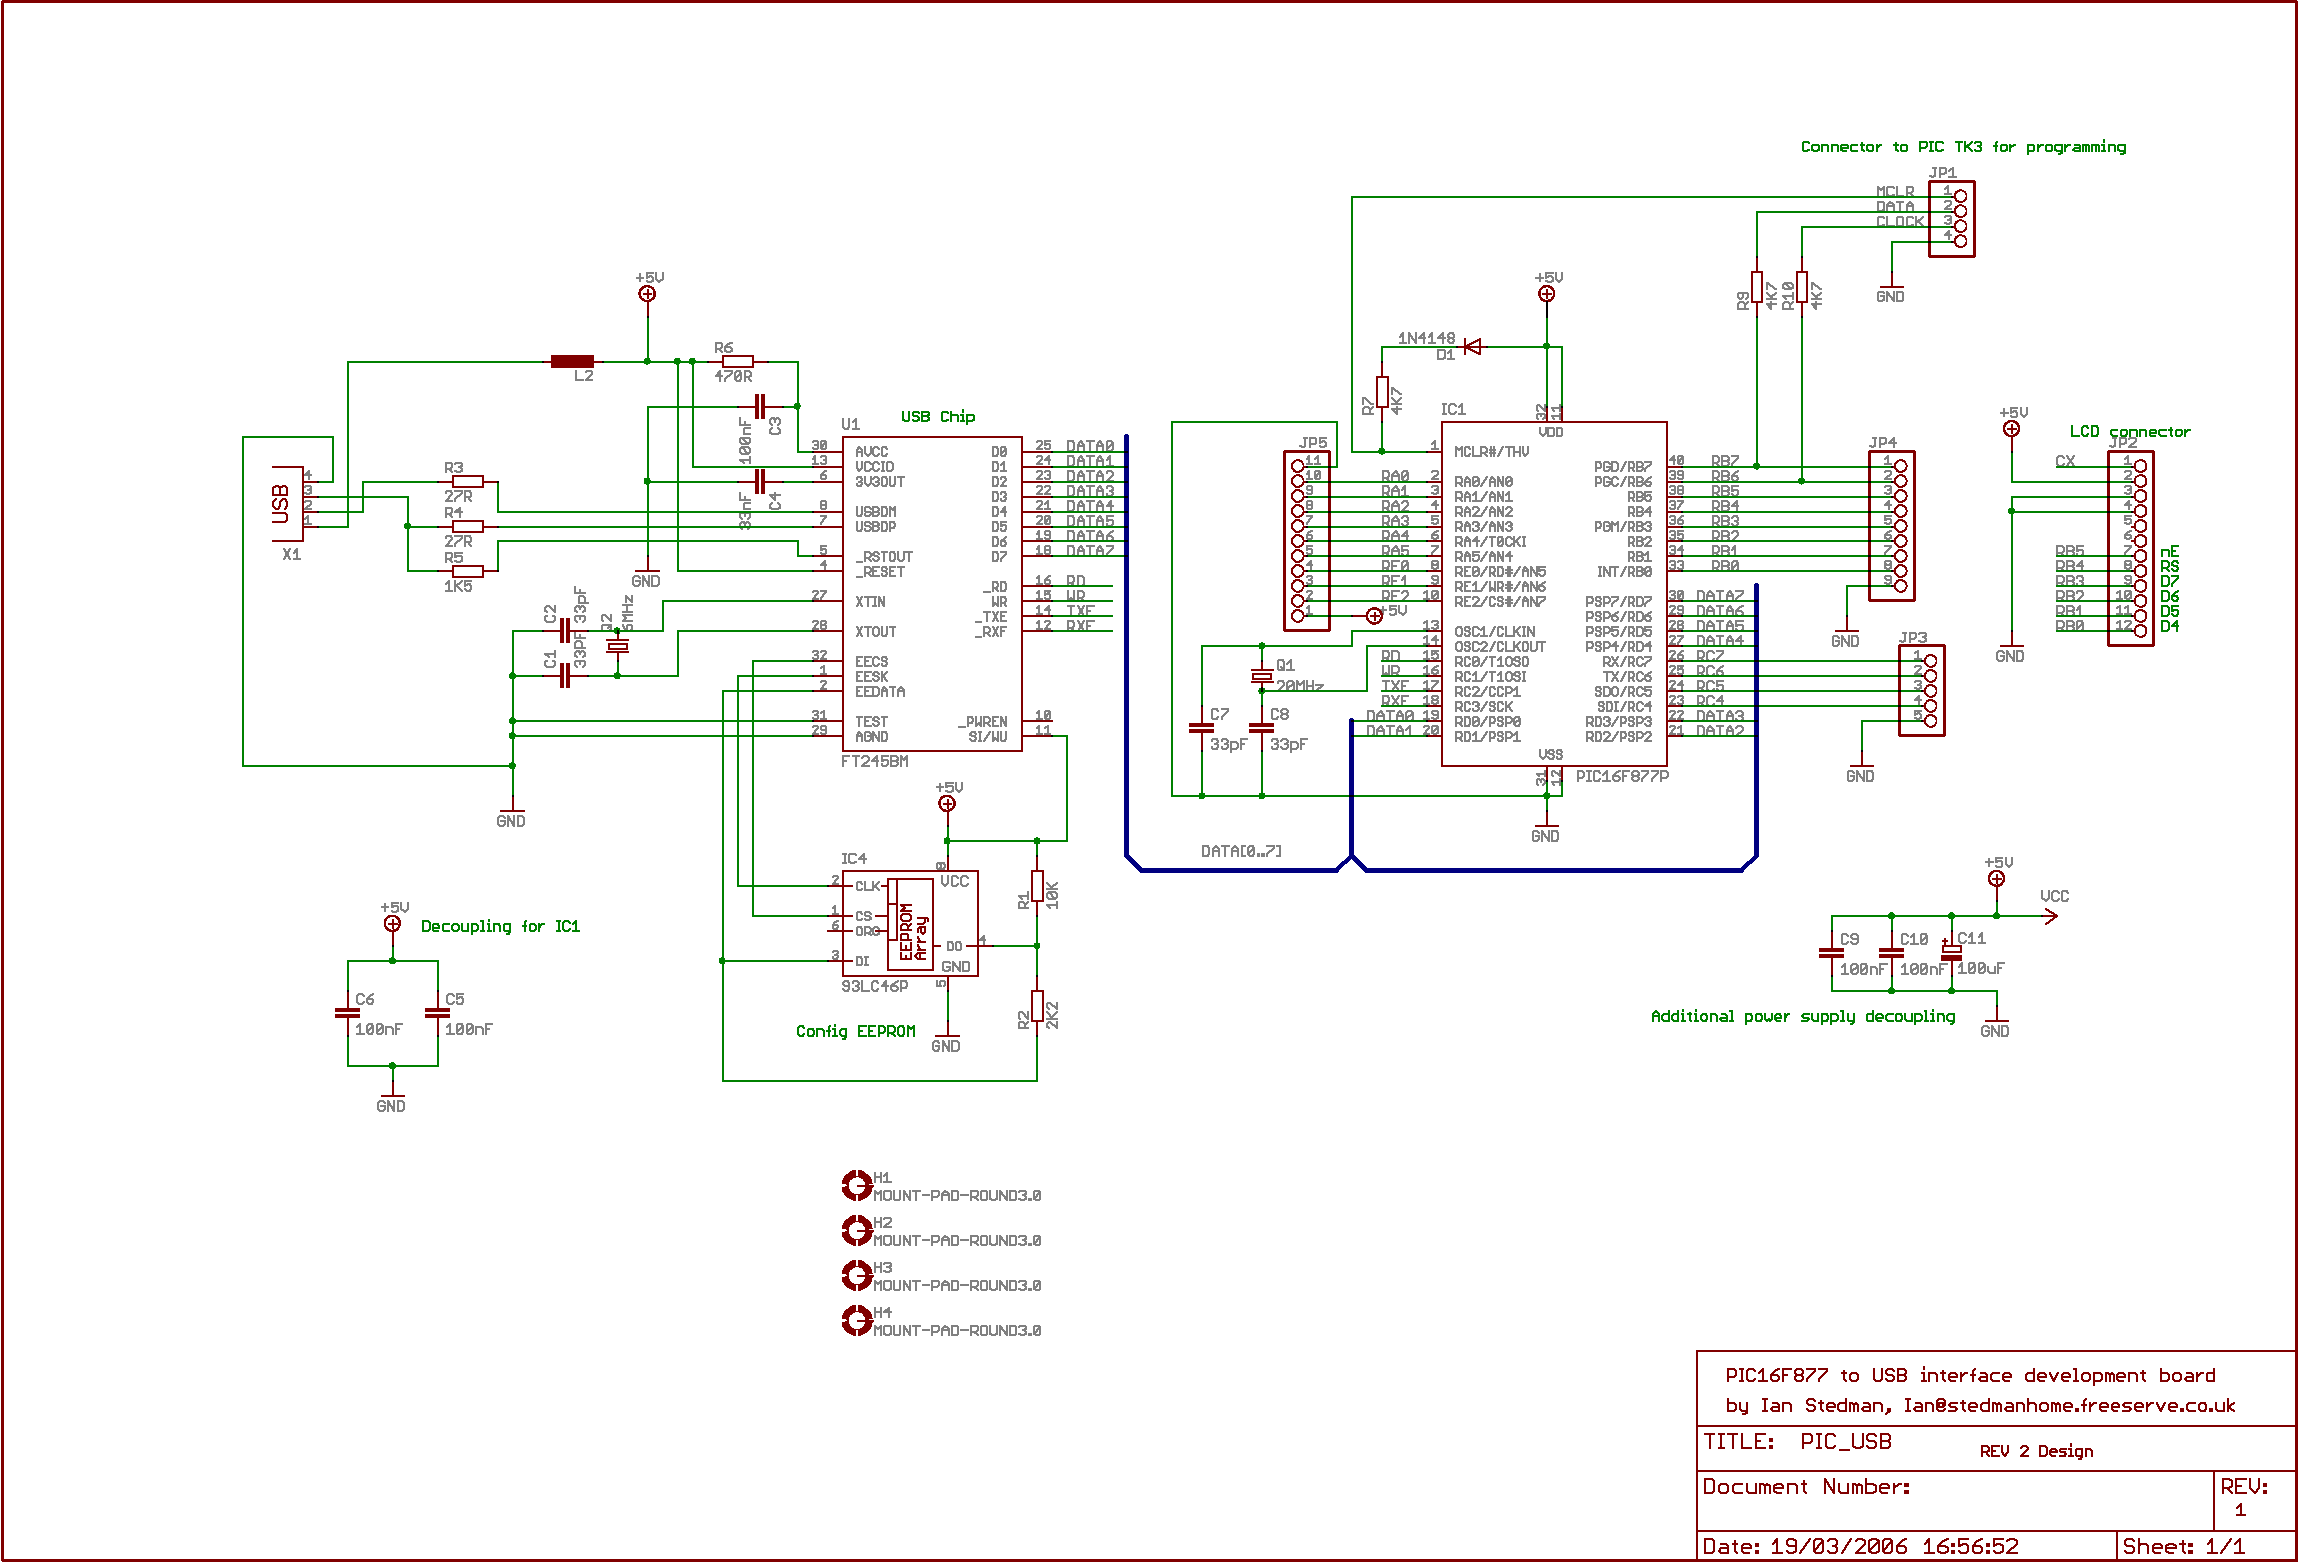 Pleasant Serial Port Usb Schematic Premium Wiring Diagram Design Wiring Cloud Uslyletkolfr09Org